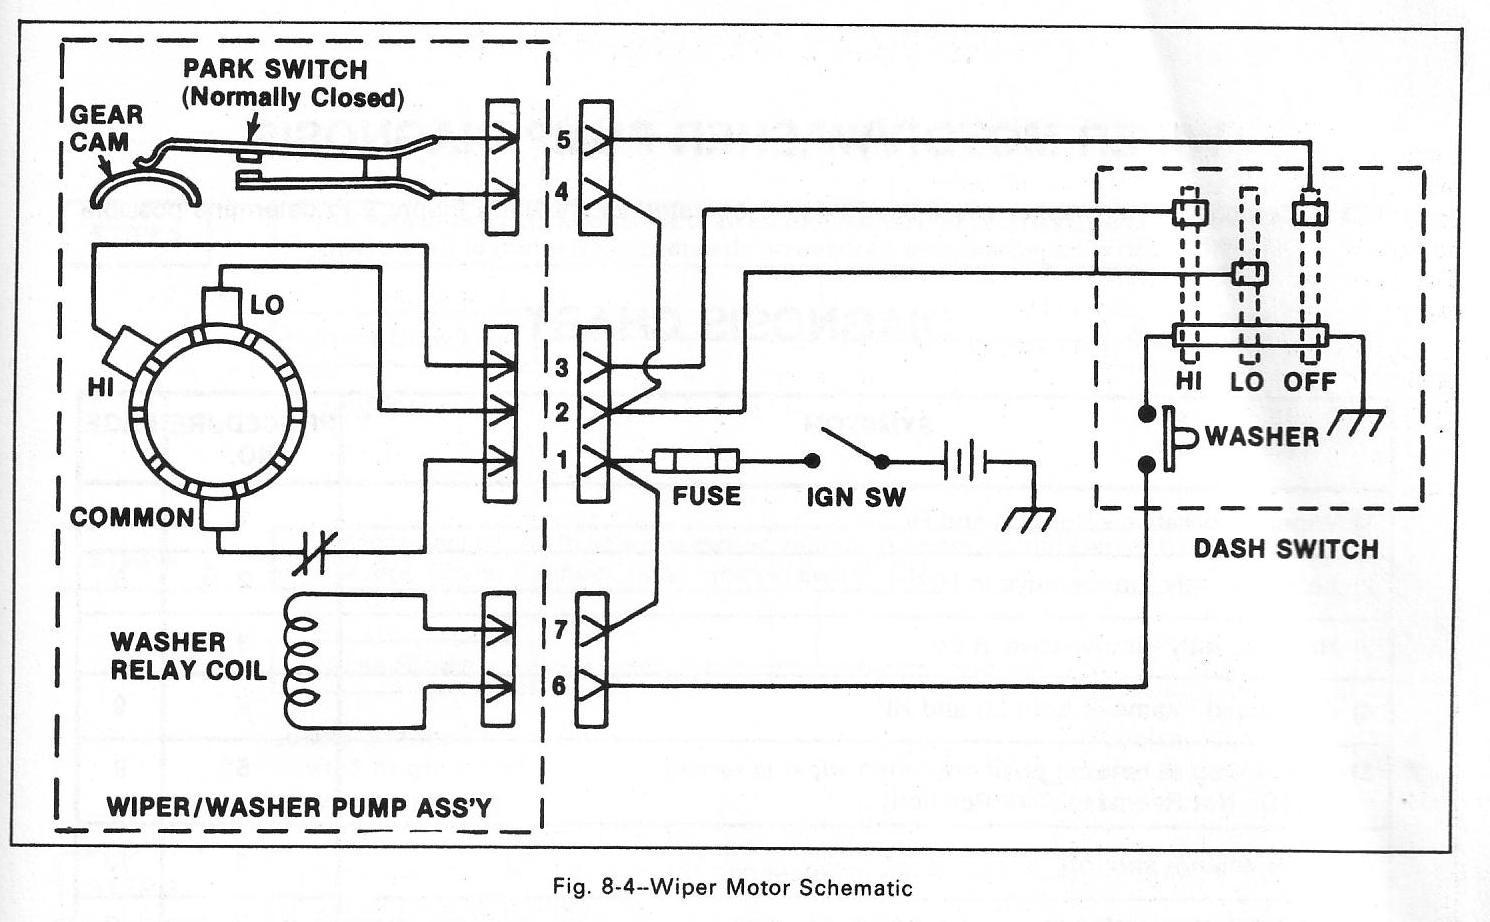 93af255 s10 wiper motor wiring diagram | wiring resources  wiring resources